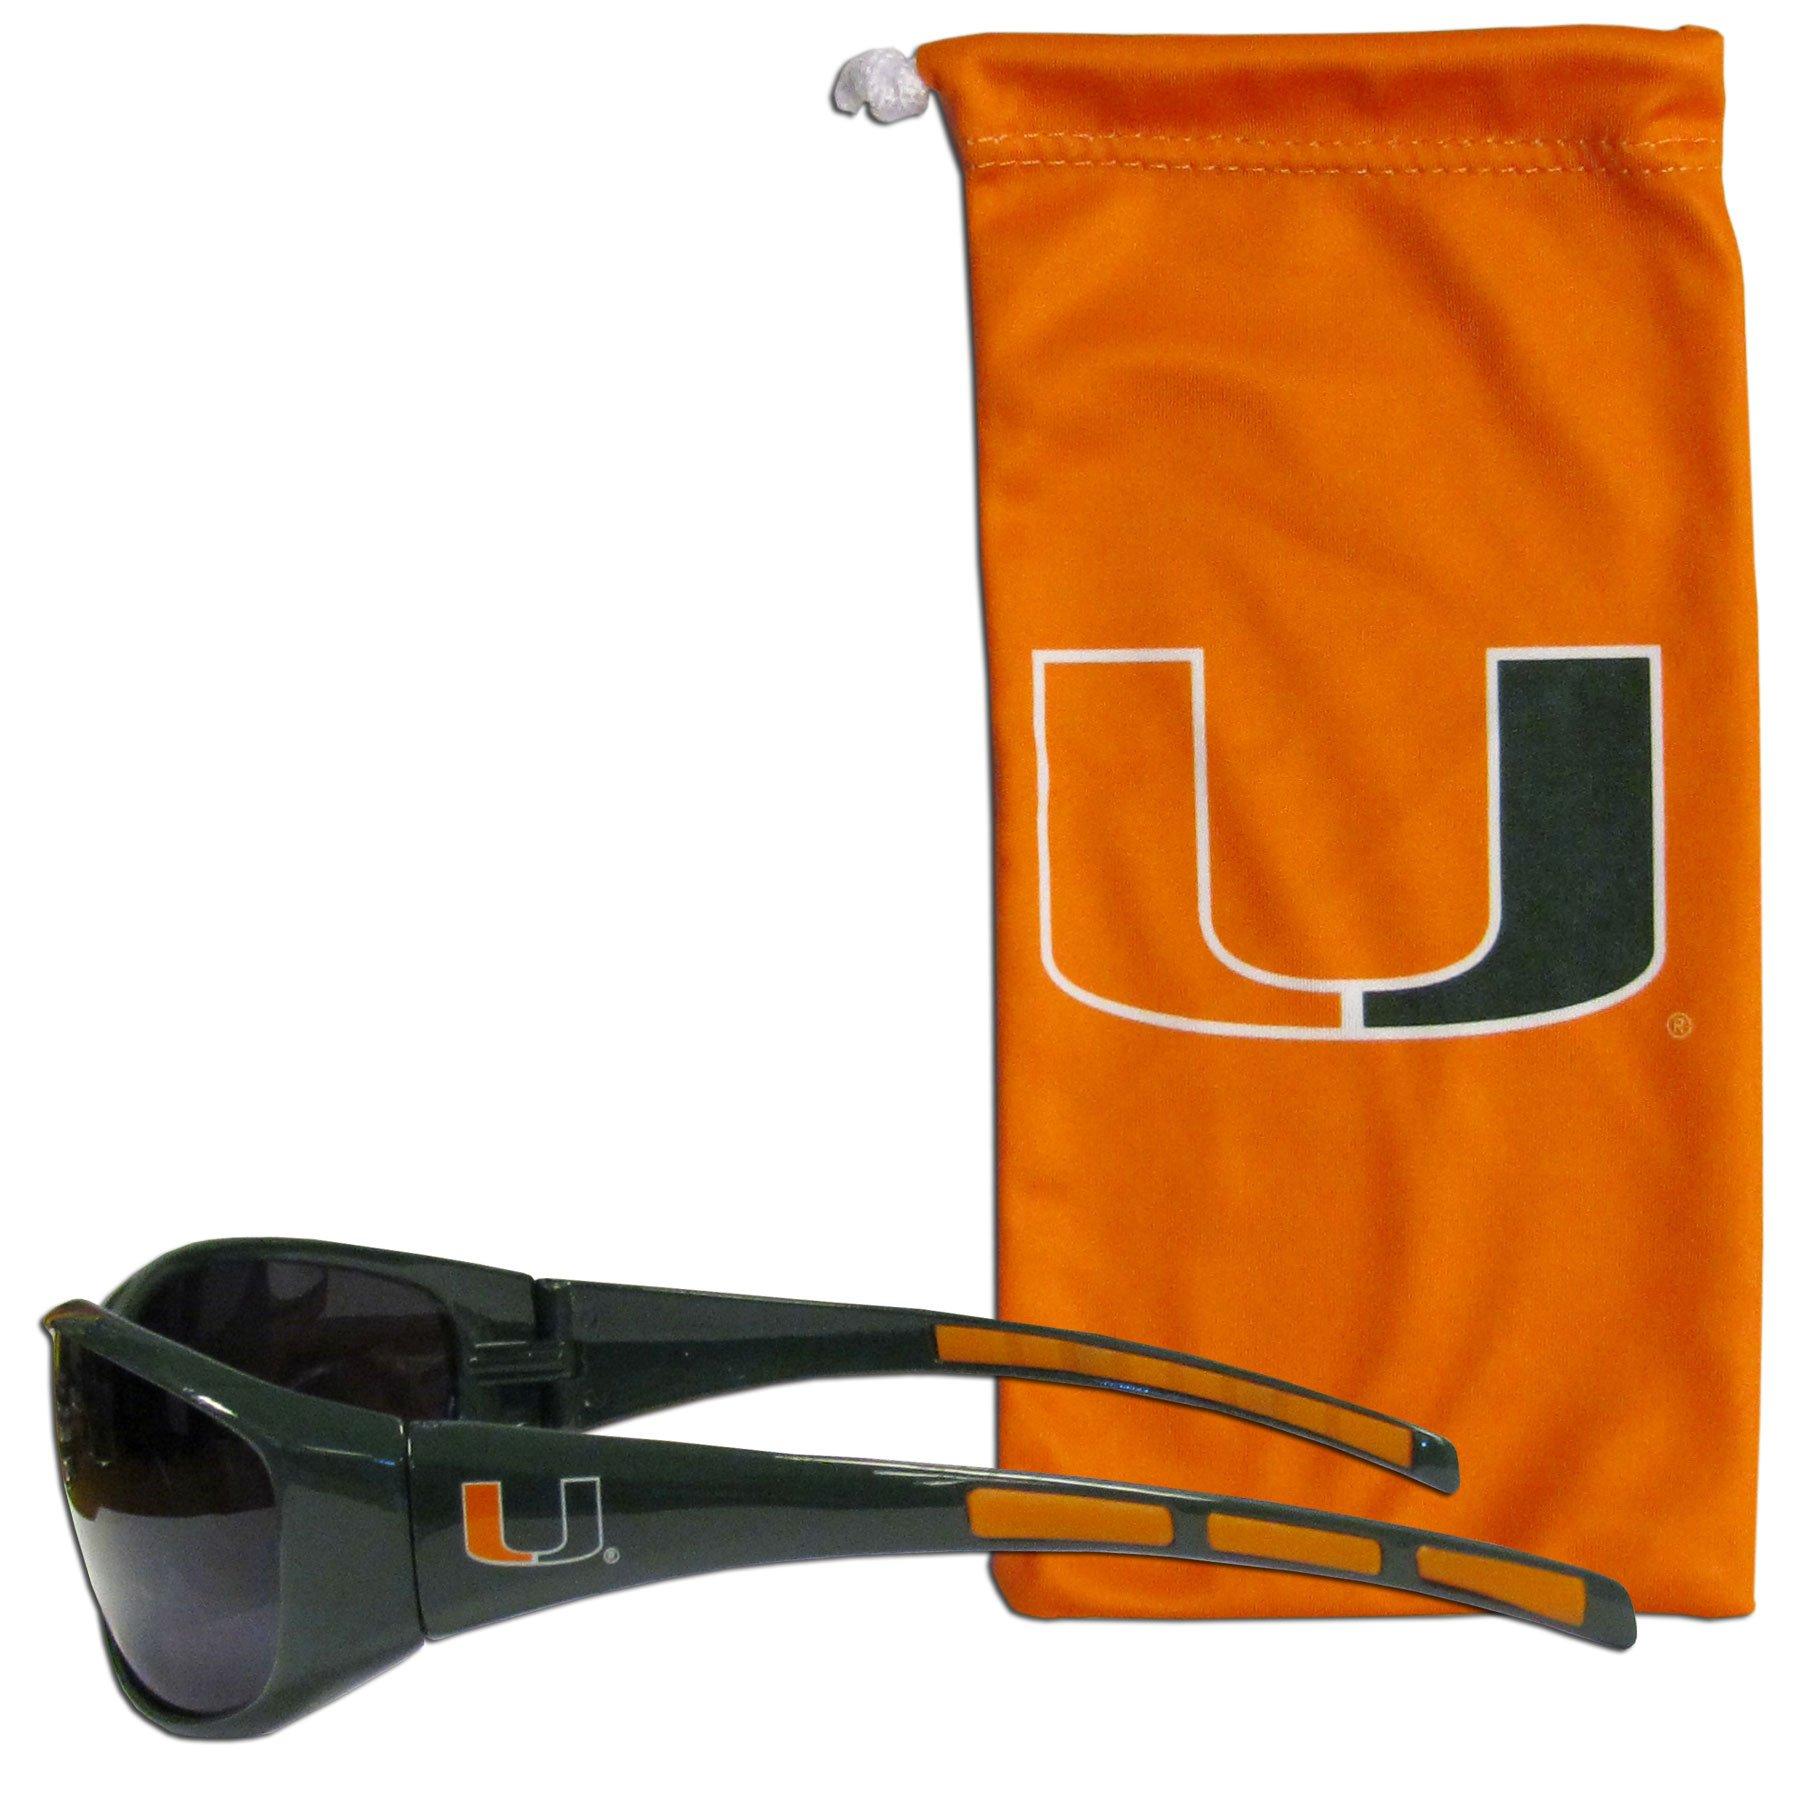 Siskiyou NCAA Miami Hurricanes Adult Sunglass and Bag Set, Orange